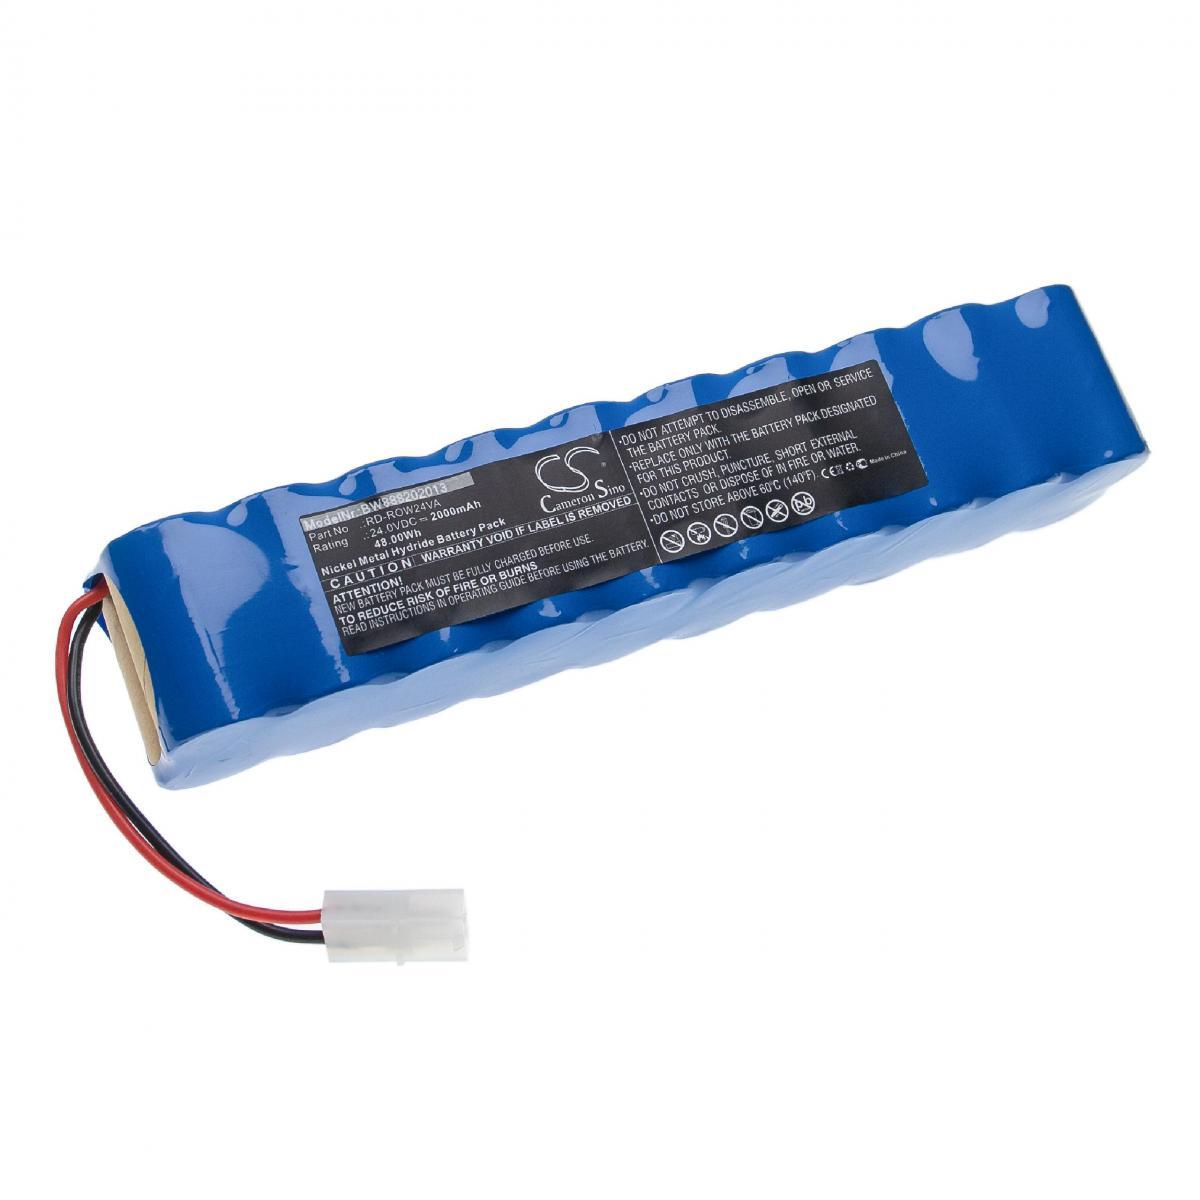 Vhbw vhbw batterie compatible avec Rowenta Air Force Extreme RH8828WO/2D2, RH8829 aspirateur Home Cleaner (2000mAh, 24V, NiMH